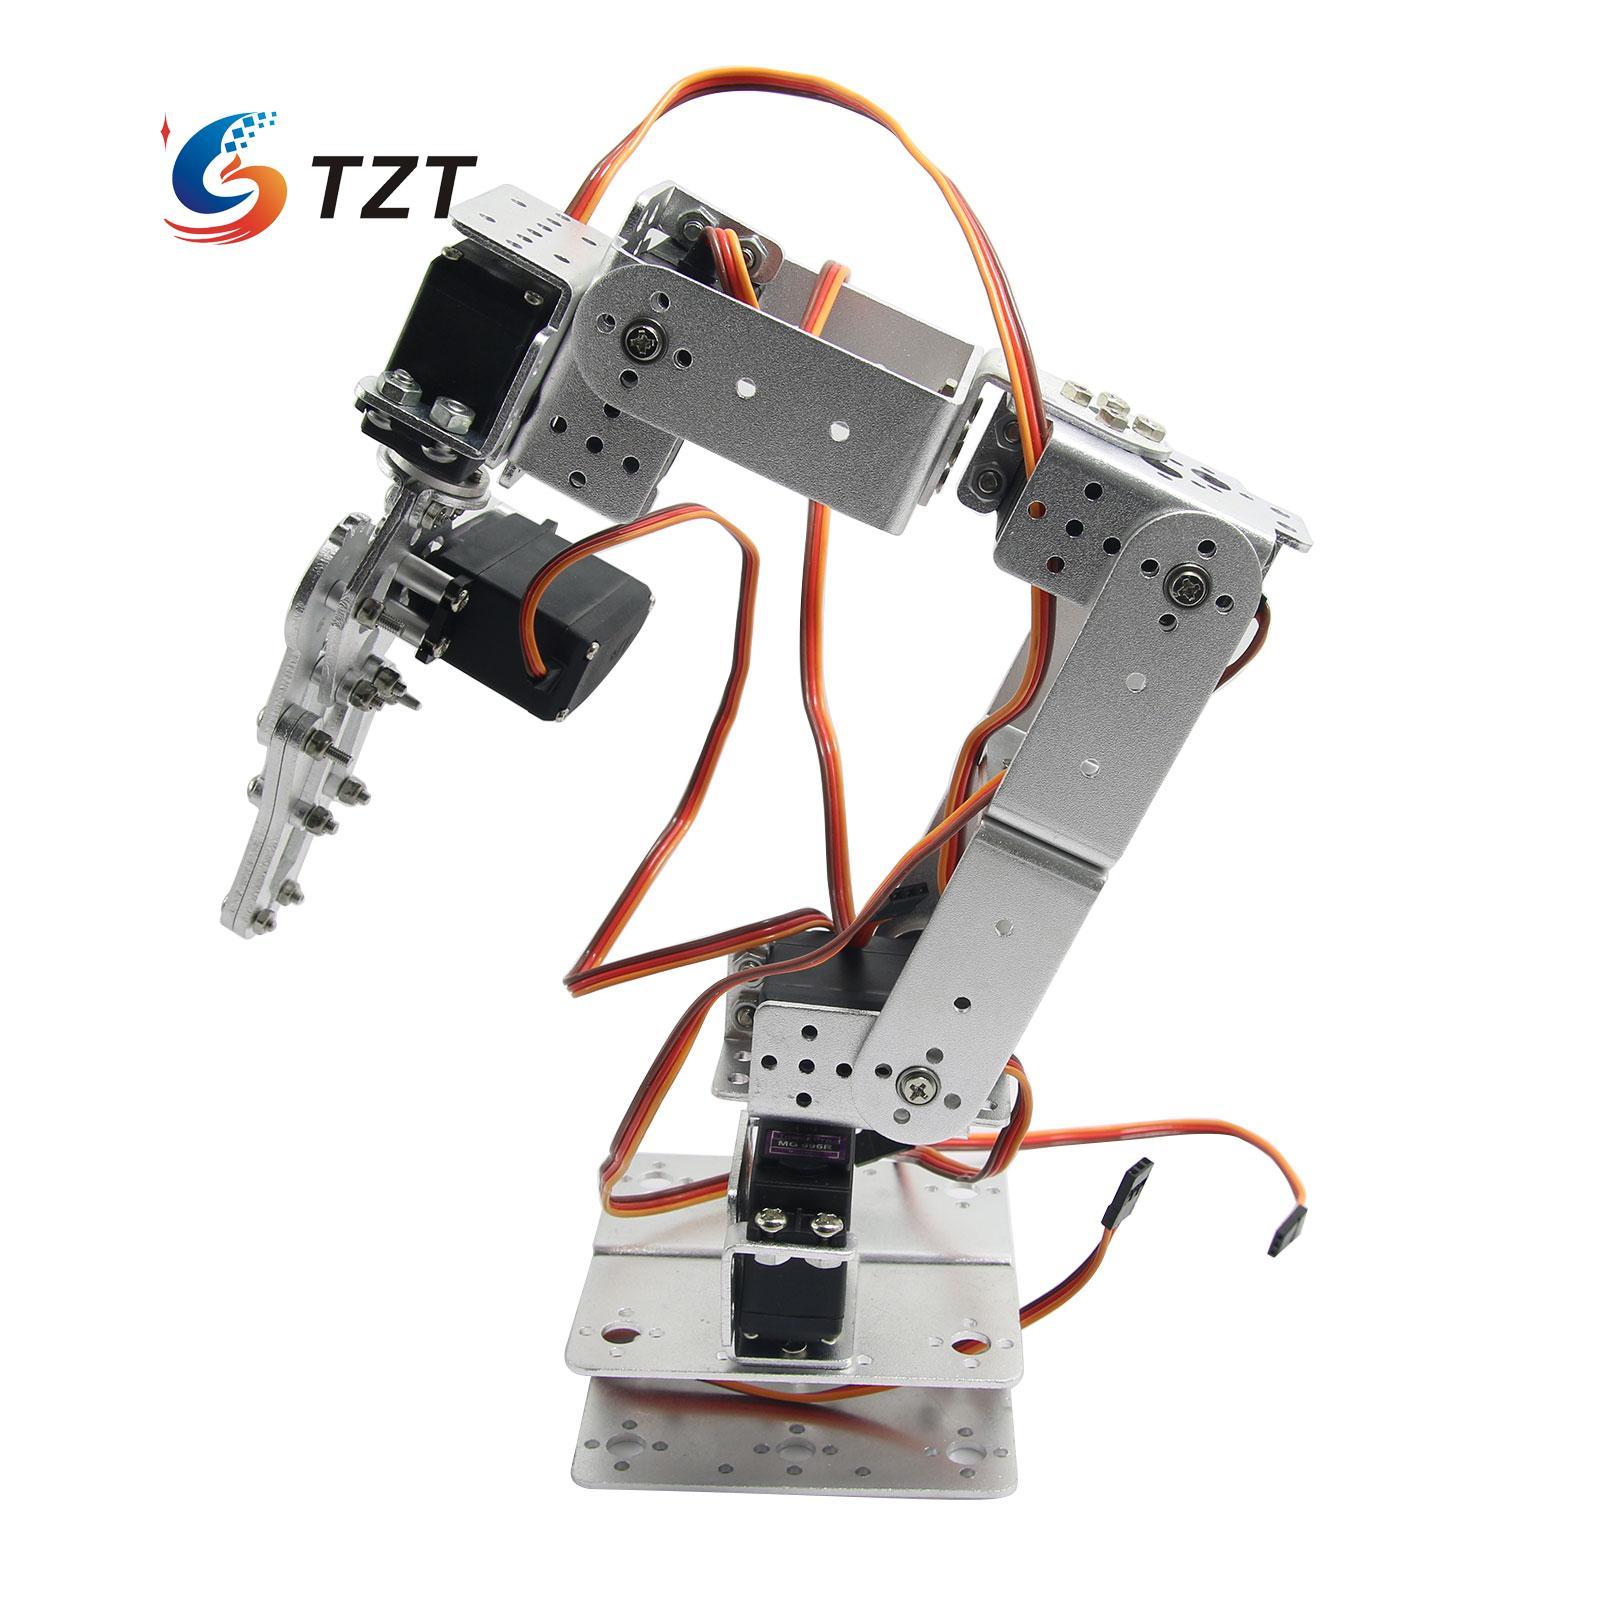 Aluminium Robot 6 DOF Arm Mechanical Robotic Arm Clamp Claw Mount Kit w Servos Servo Horn